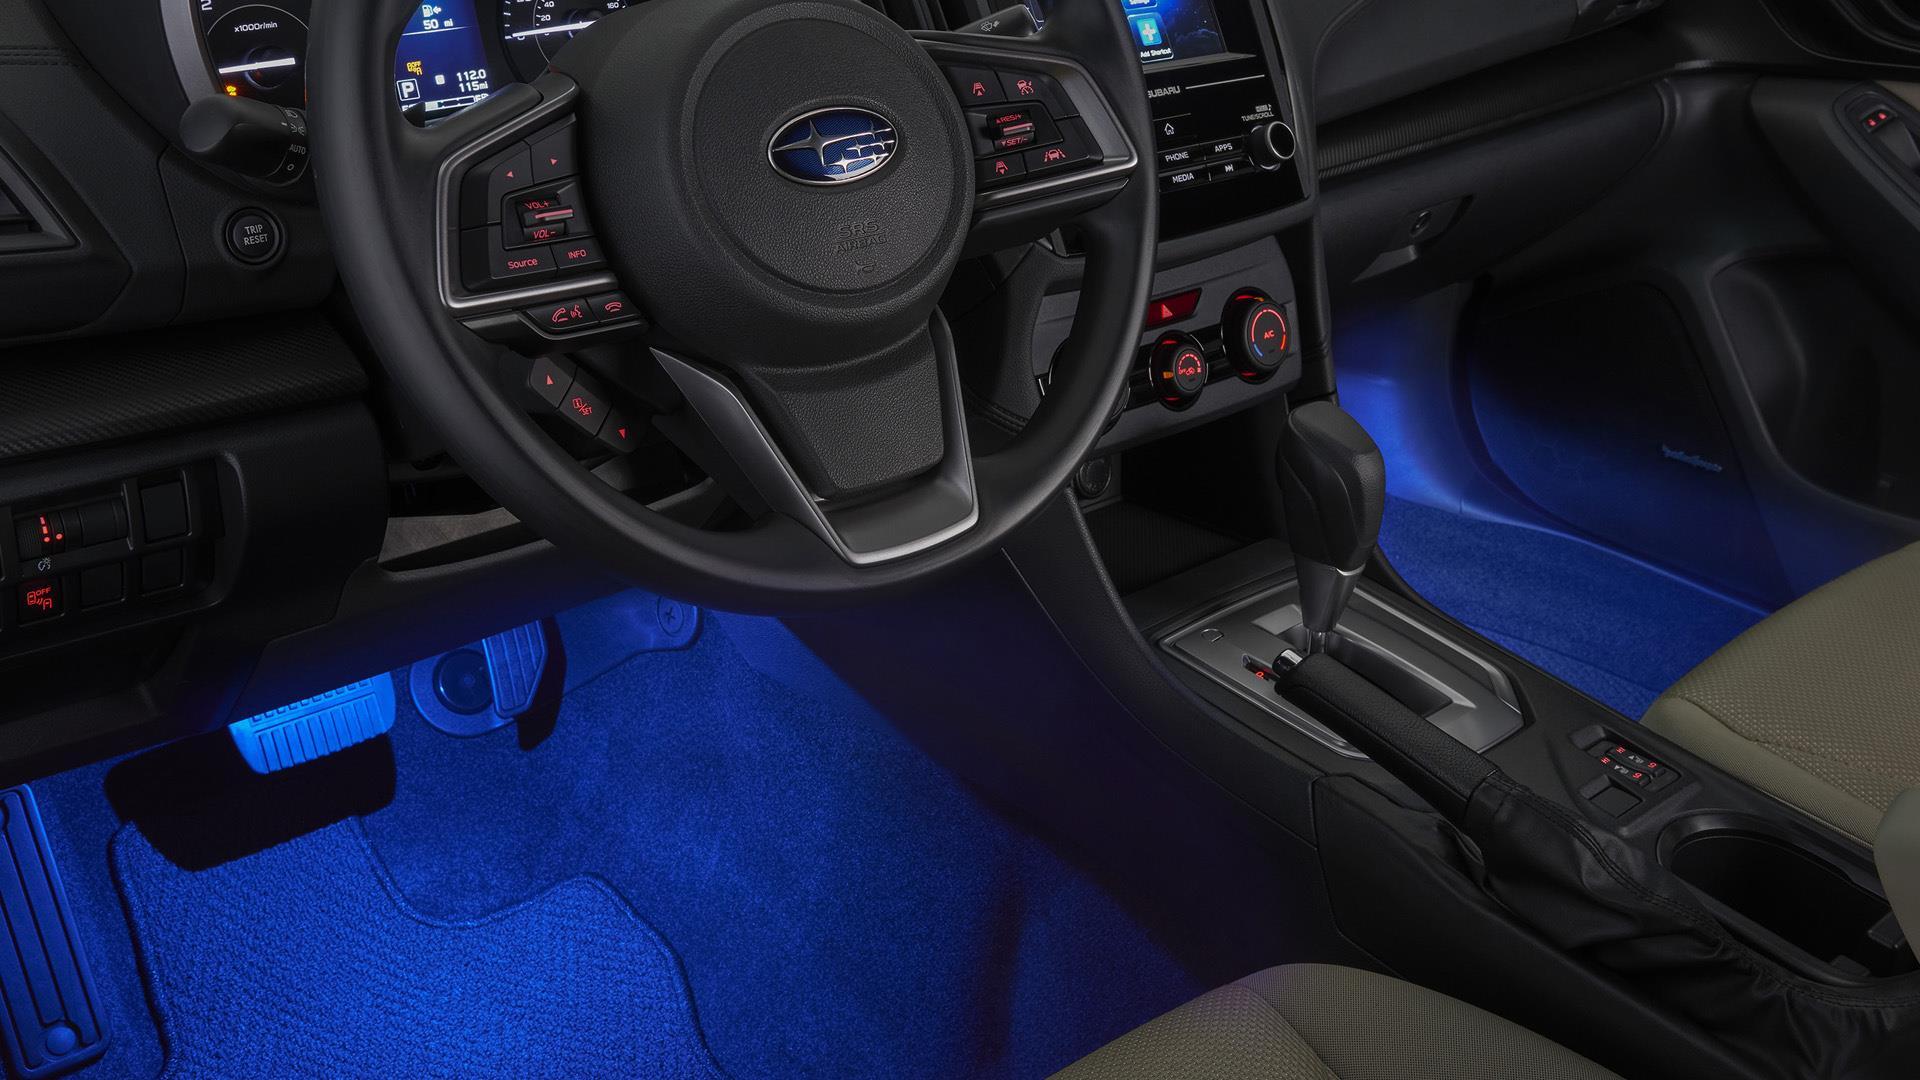 Shop Genuine 2018 Subaru Crosstrek Accessories | Subaru of ...